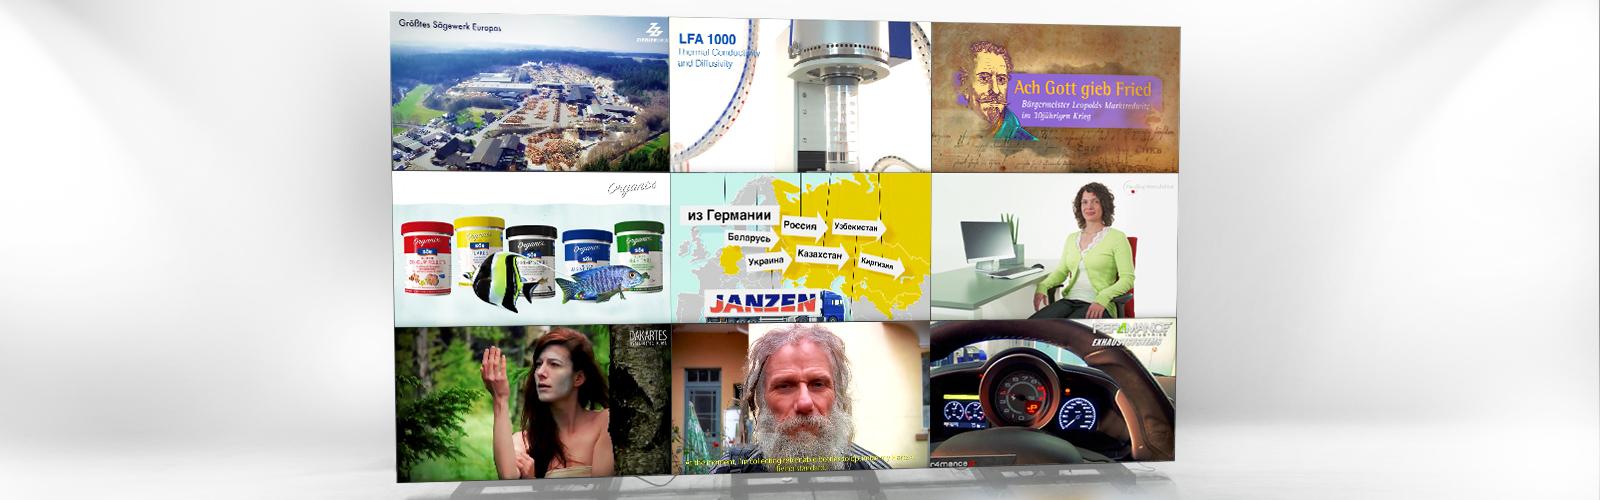 Imagefilm Video Produktvideo Werbevideo Film Tourismusvideo Messefilm